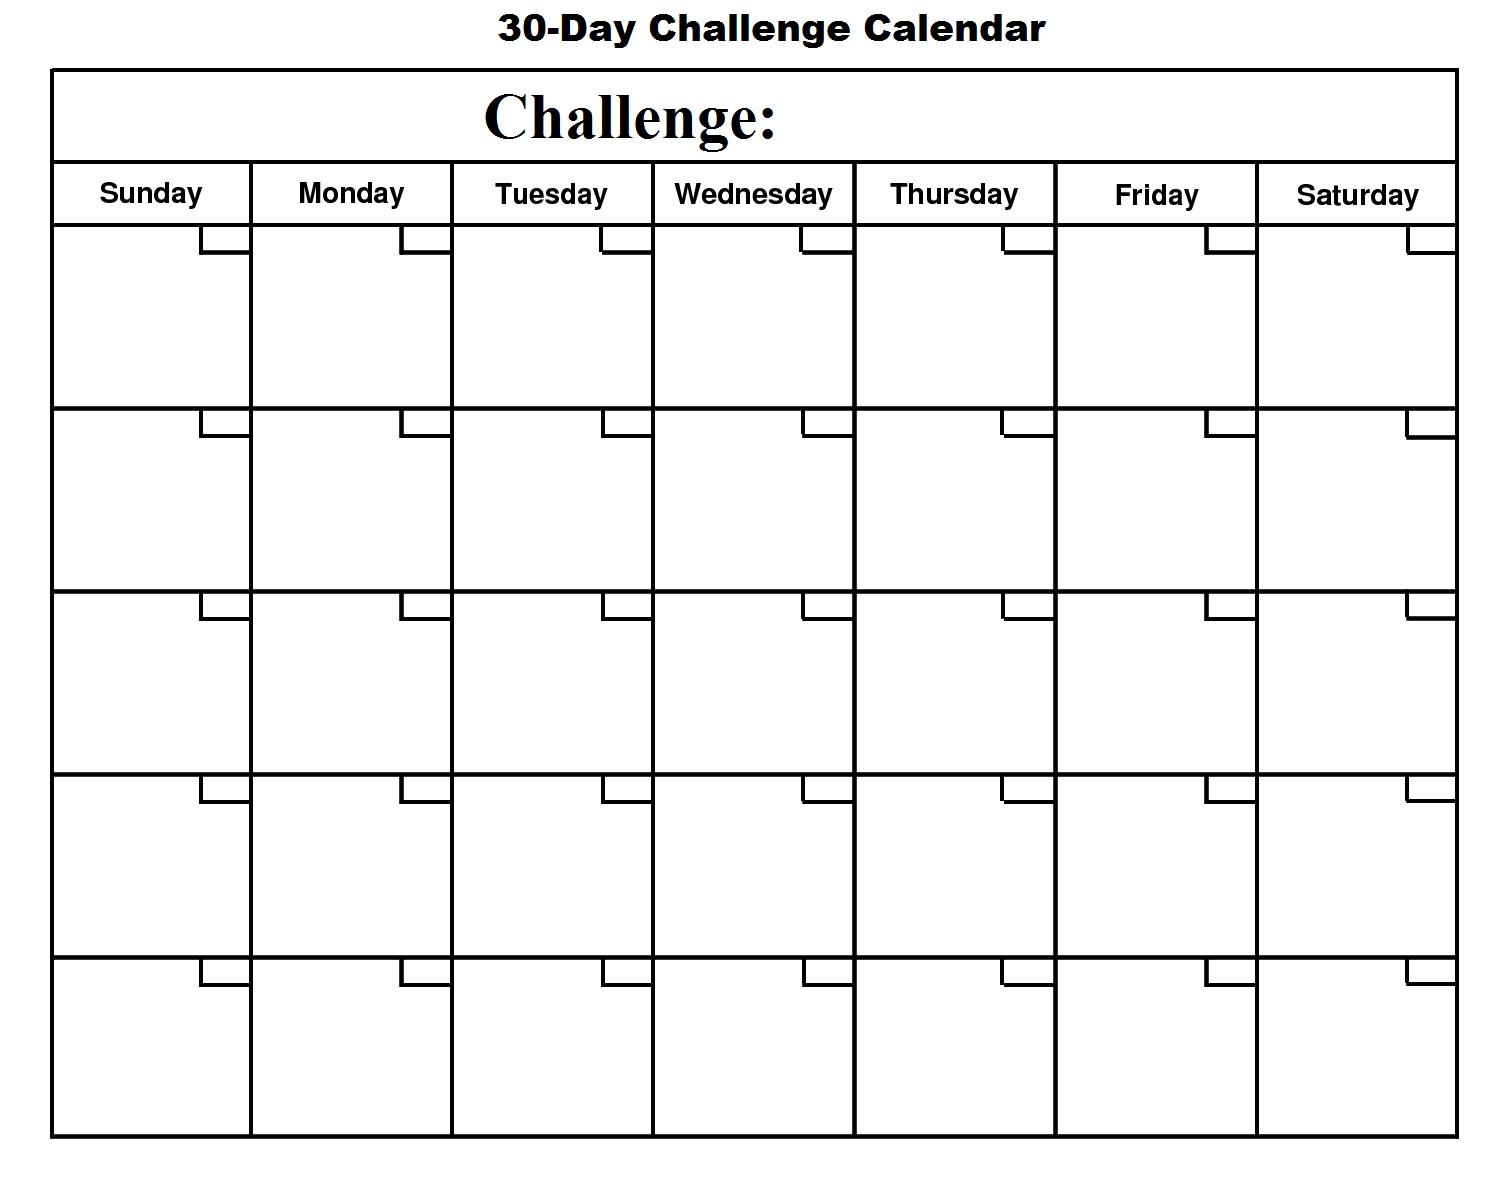 30 Day Calendar Yun56co3abry